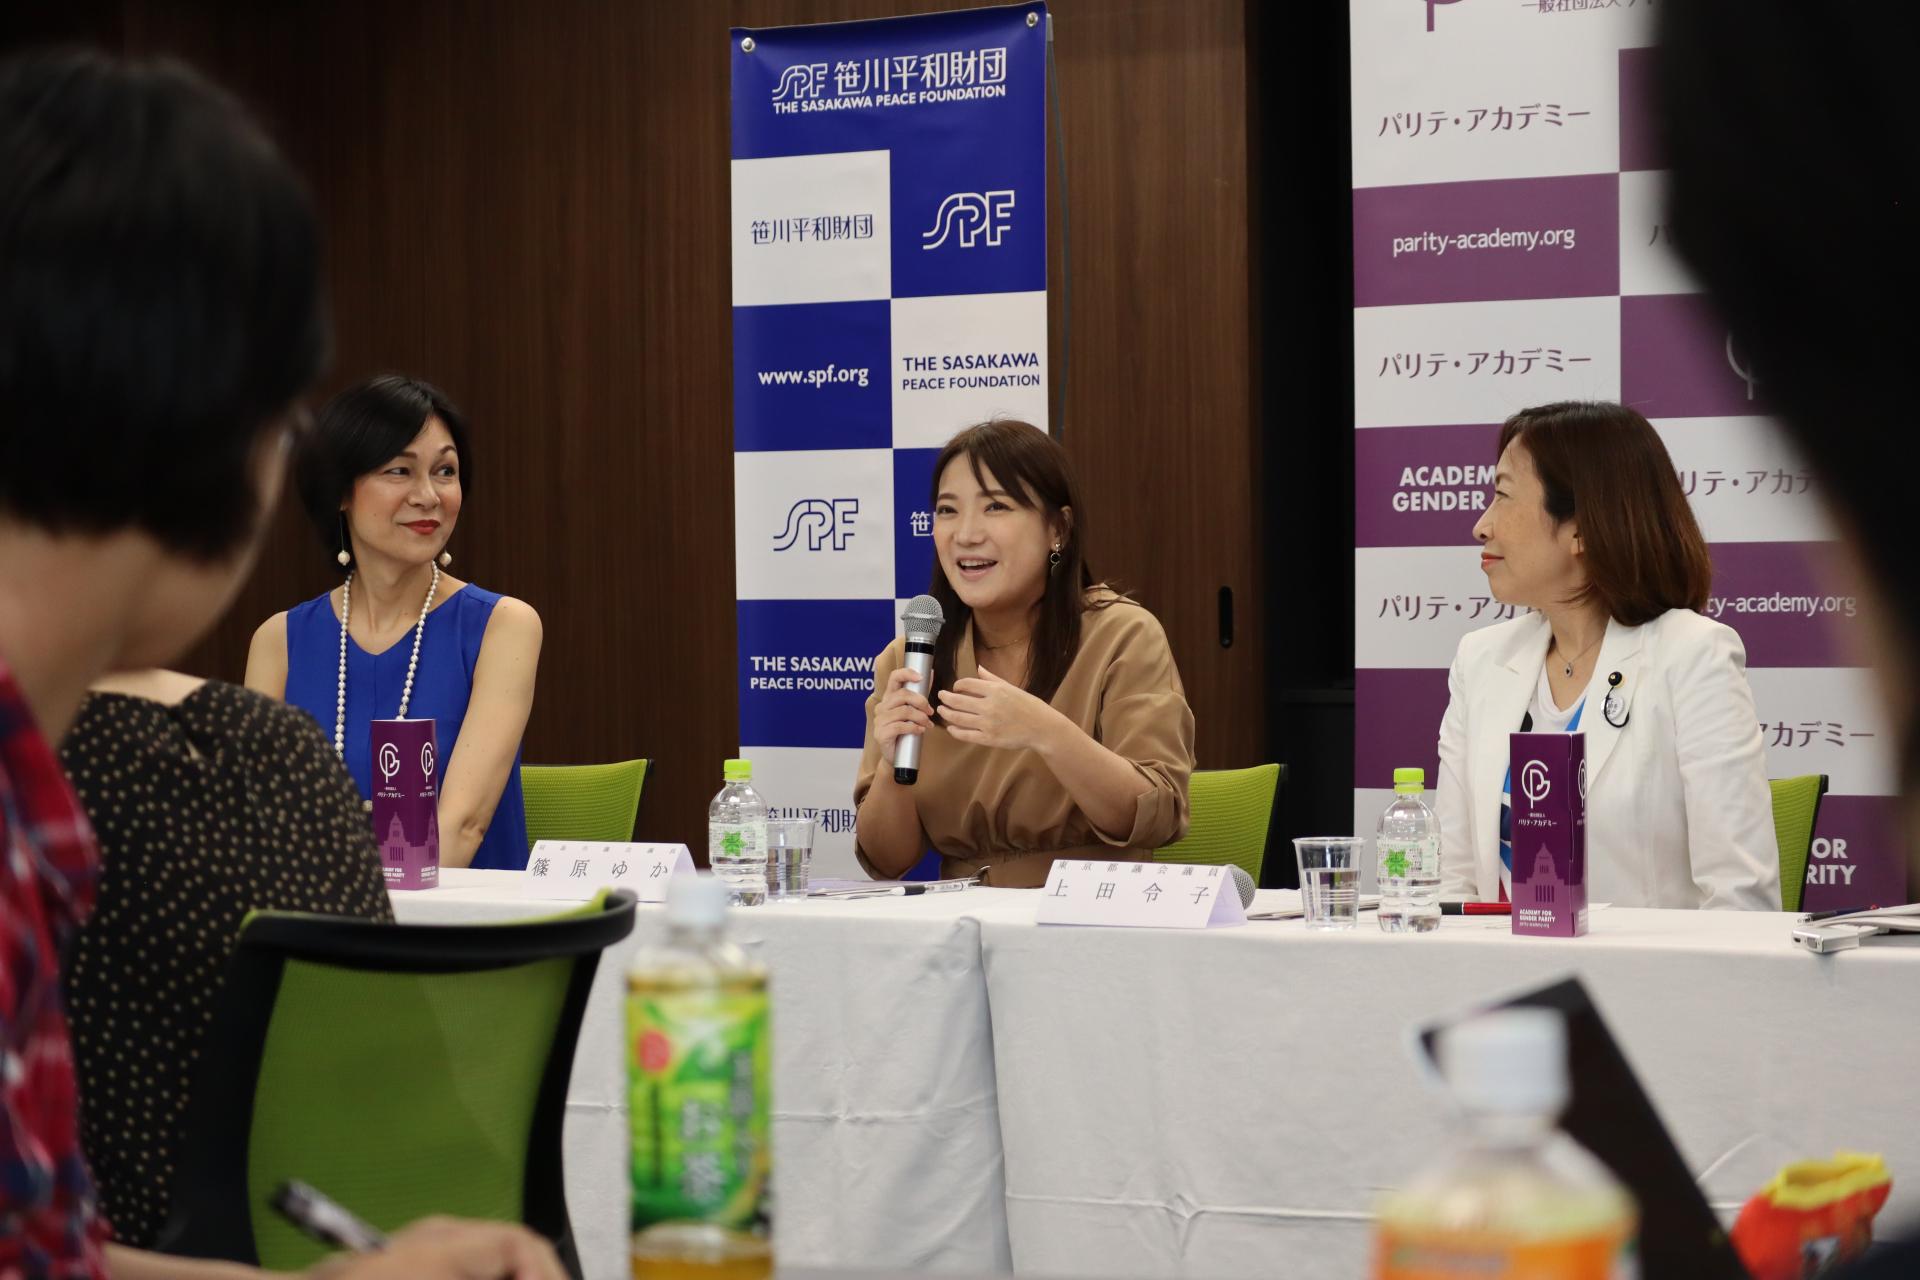 From left to right: Assembly member for Shinjuku Ward Karen Yoda, Akishima City Councilmember Yuka Shinohara, and Tokyo Metropolitan Assembly member Reiko Ueda